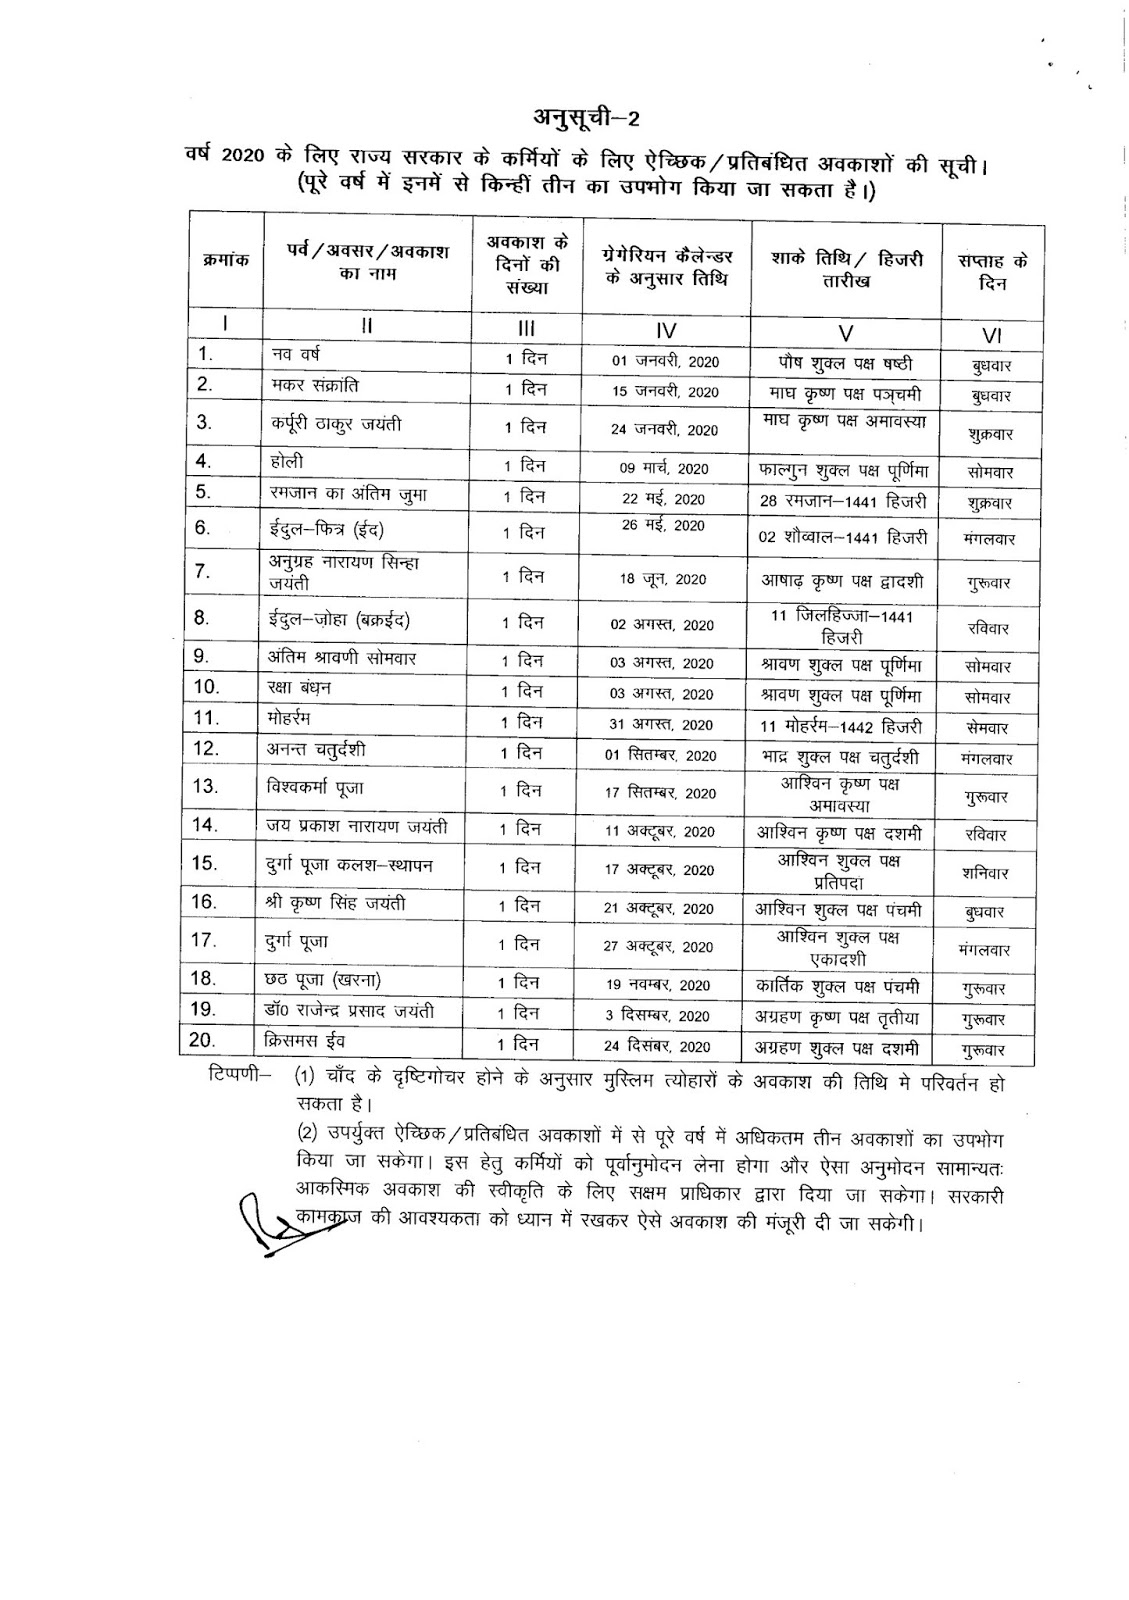 Bihar Government Calendar 2020 #educratsweb with Calendar 2020 Bihar Sarkar